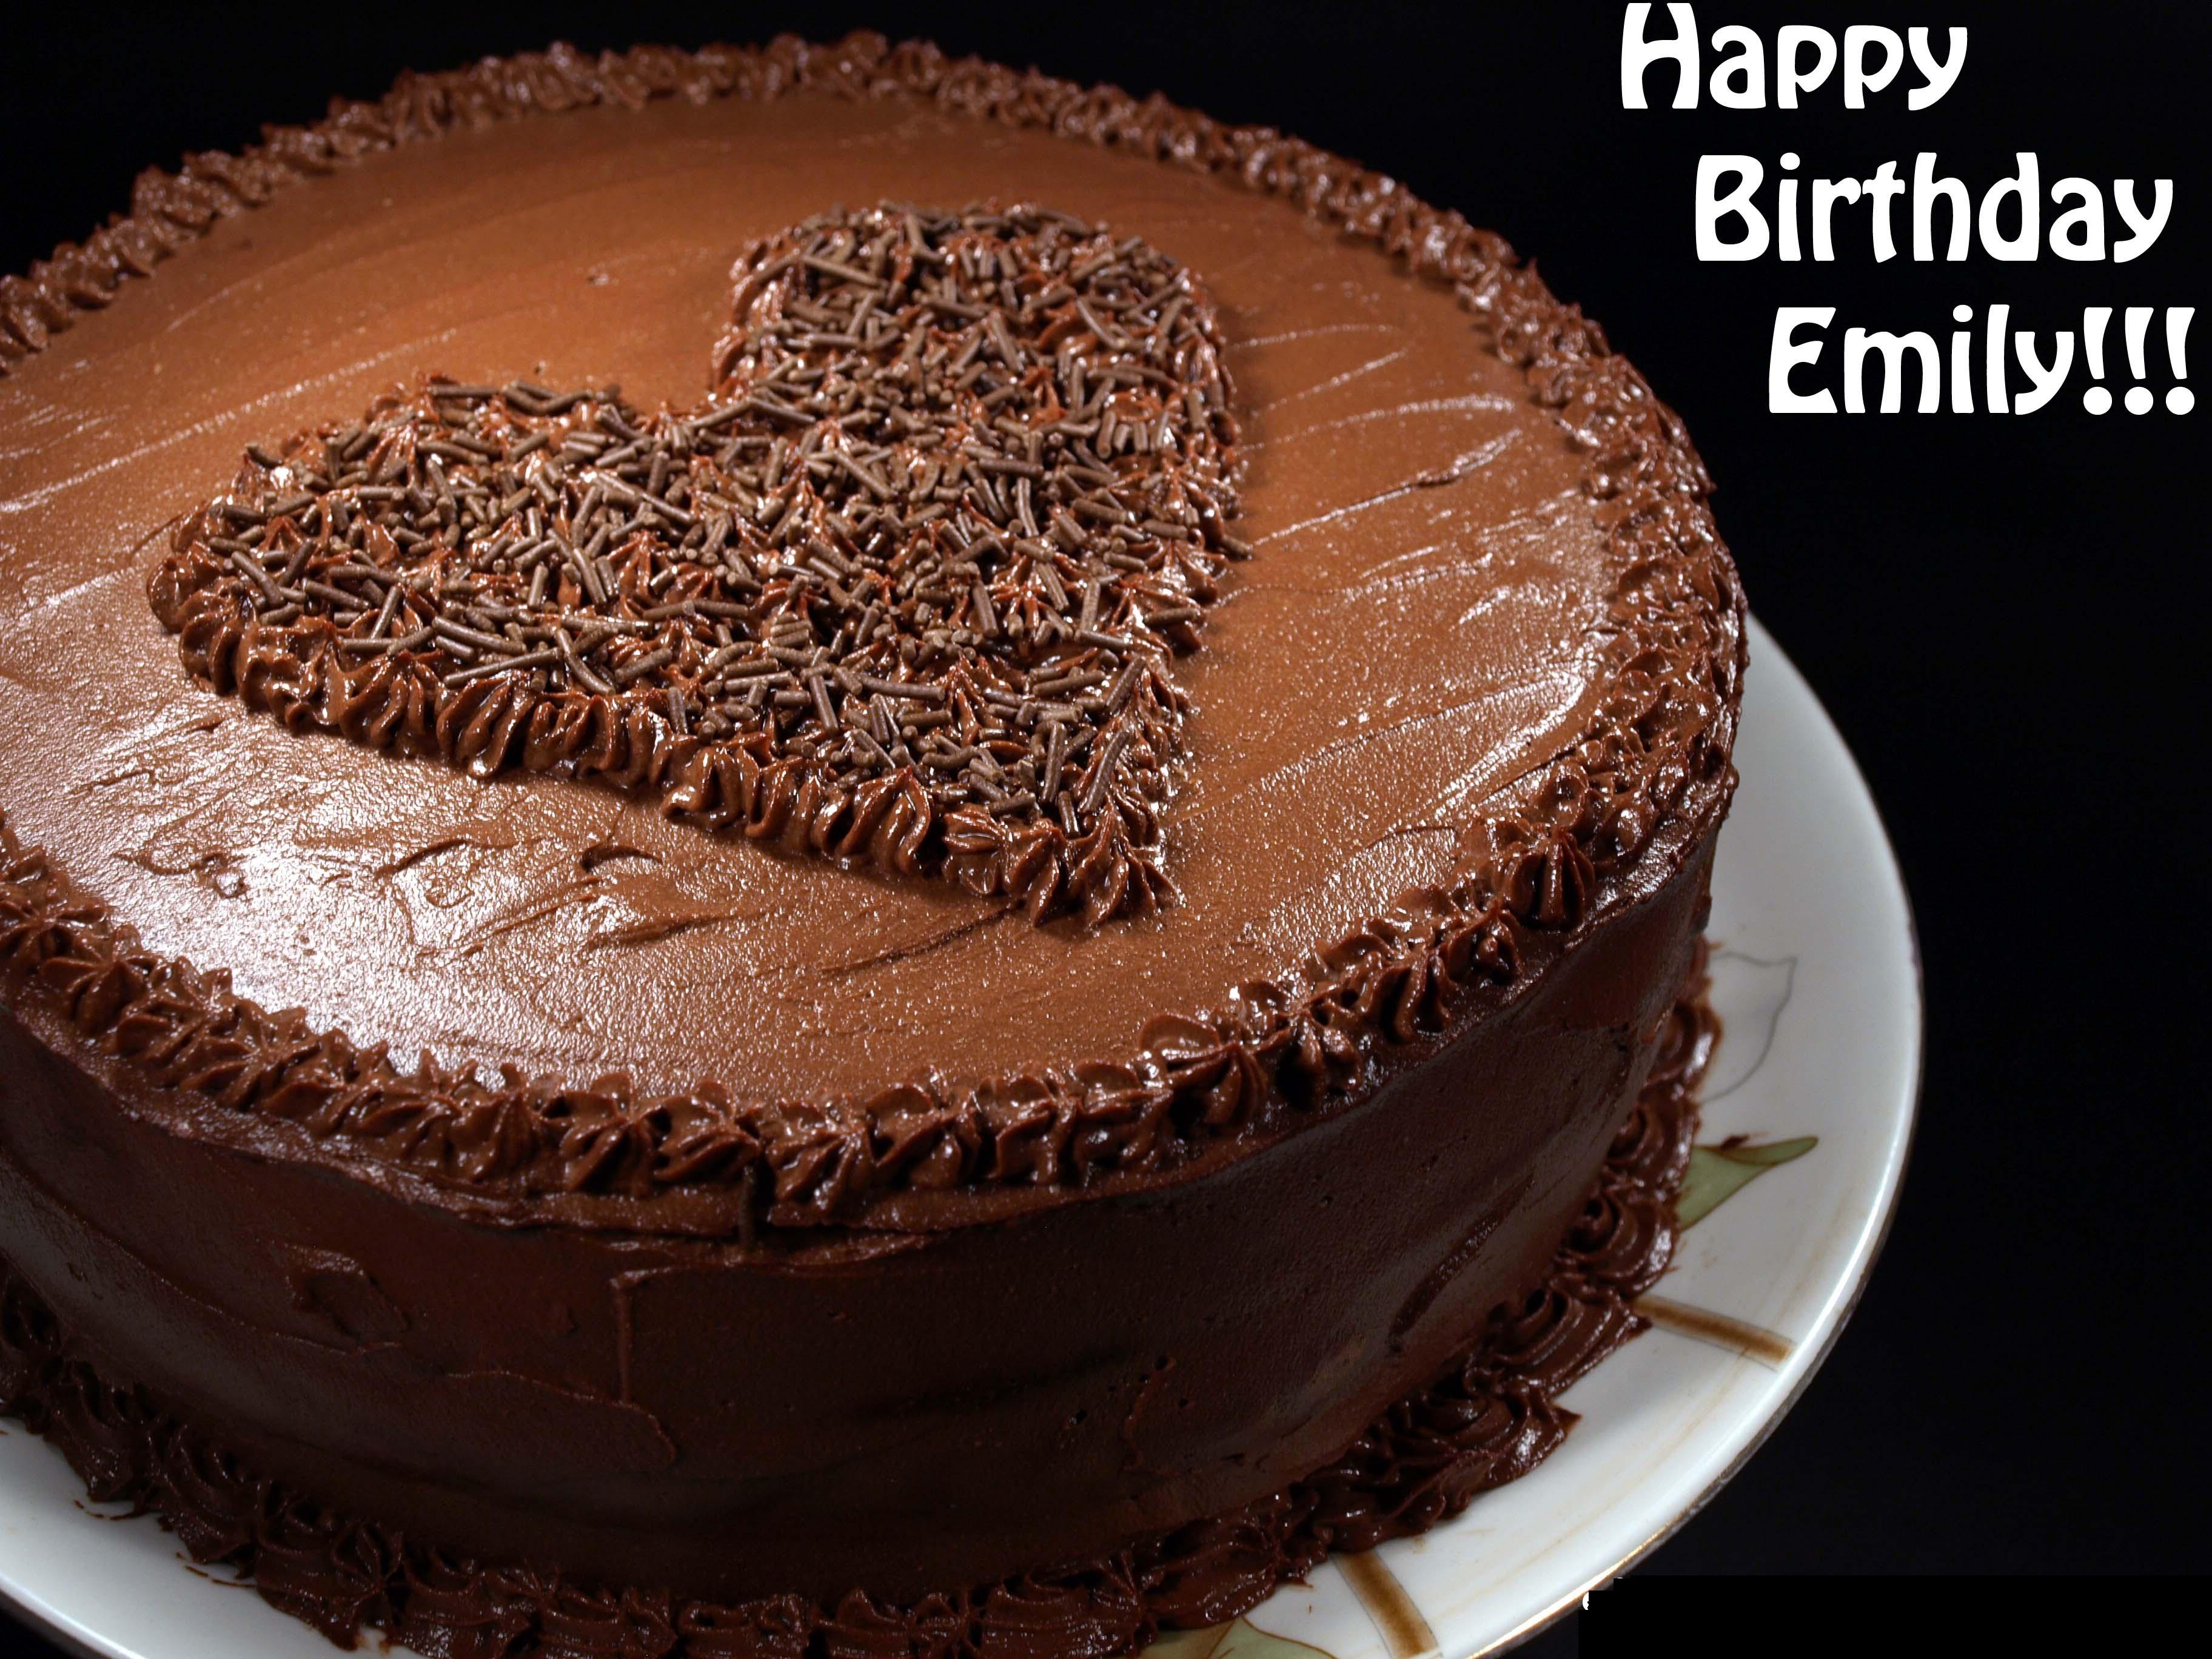 Designs Of Birthday Cake Top 10 Pinterest